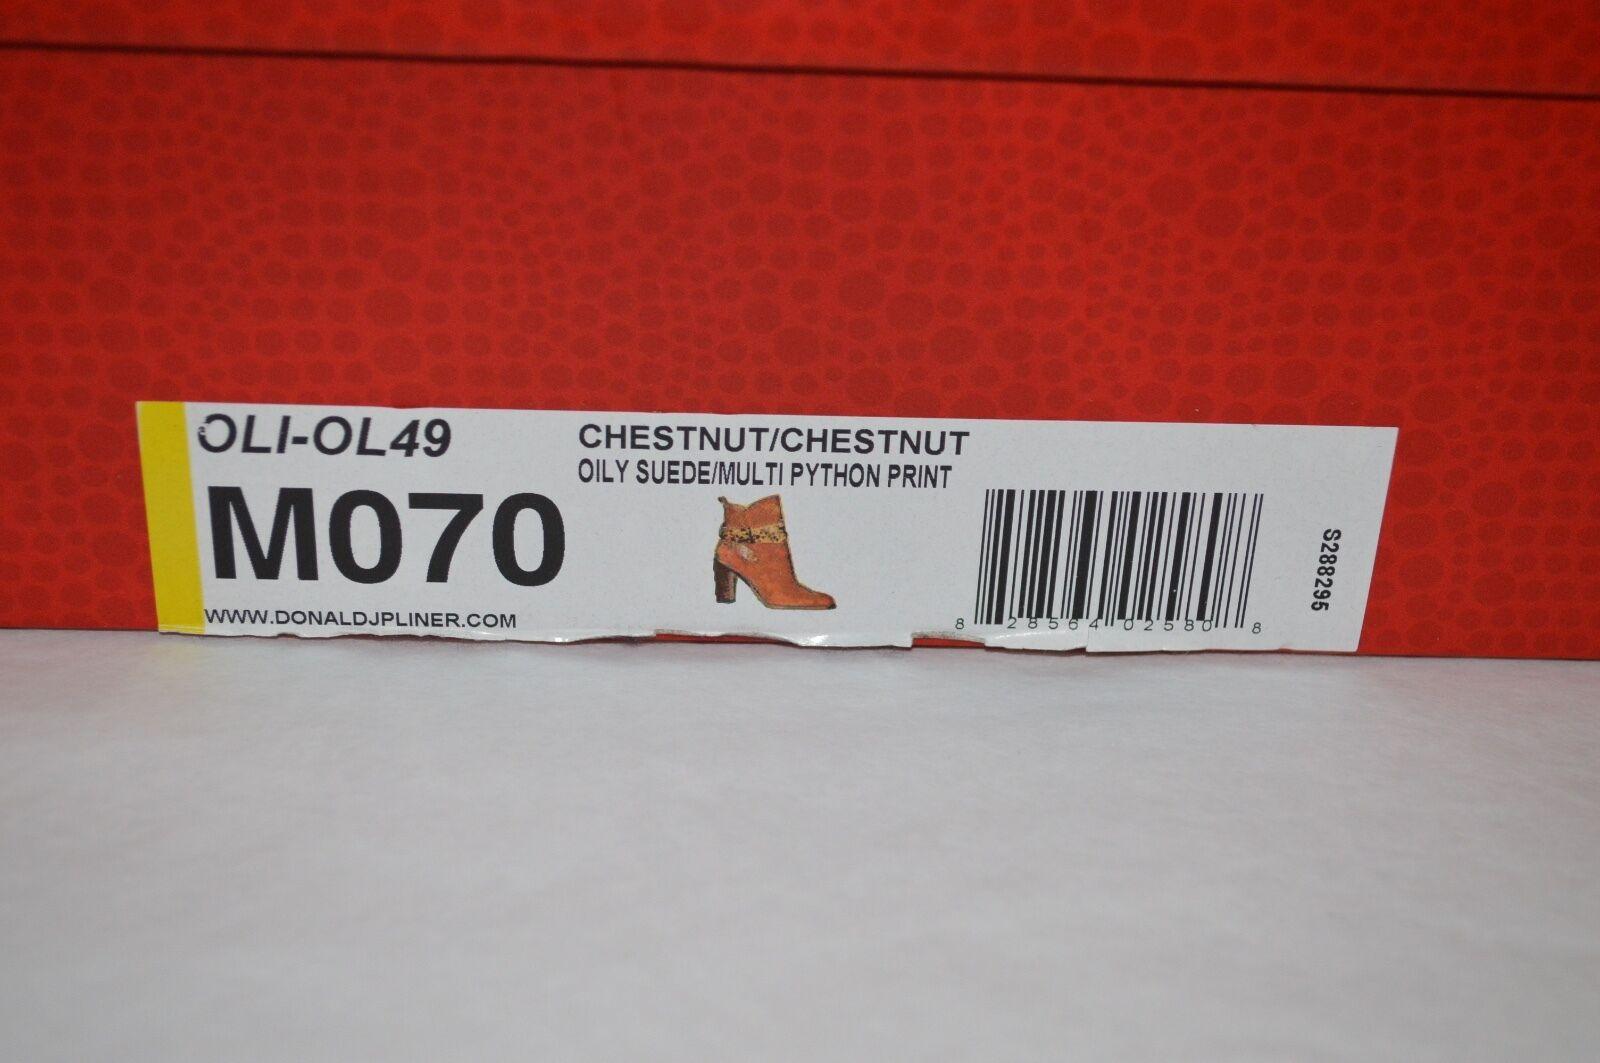 New    328 Donald J Pliner OLI-OL49 Chestnut Suede Ankle Boots Python Print sz 7 b2c72a